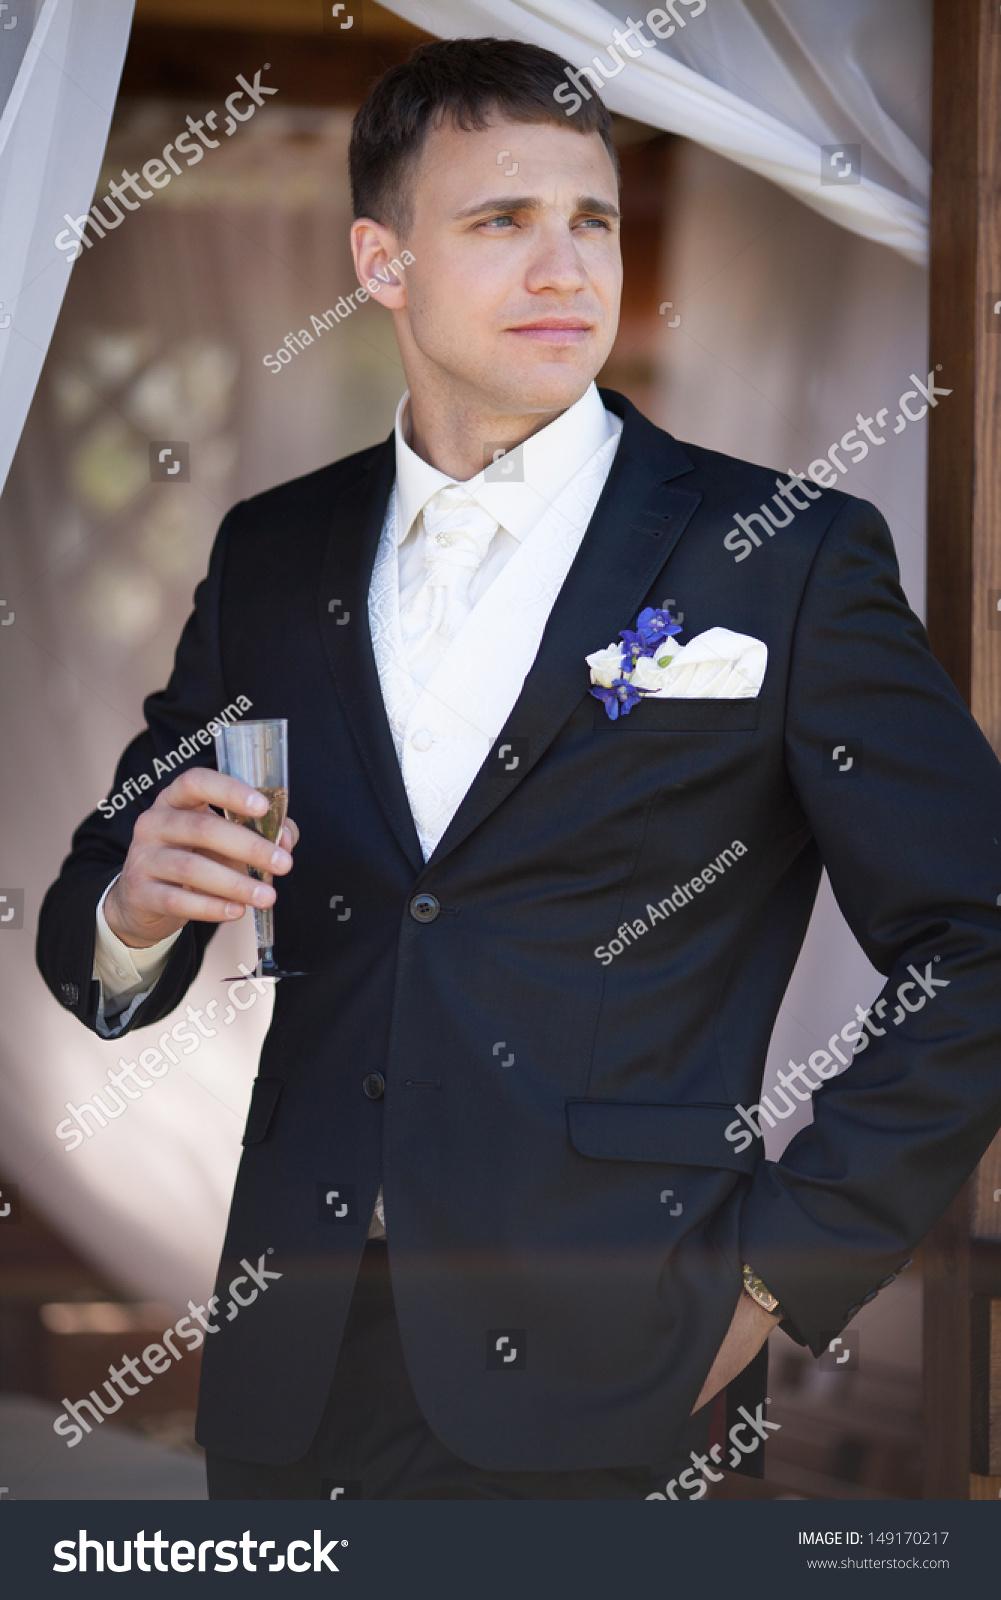 Handsome Groom Wedding Tuxedo Smiling Waiting Stock Photo ...